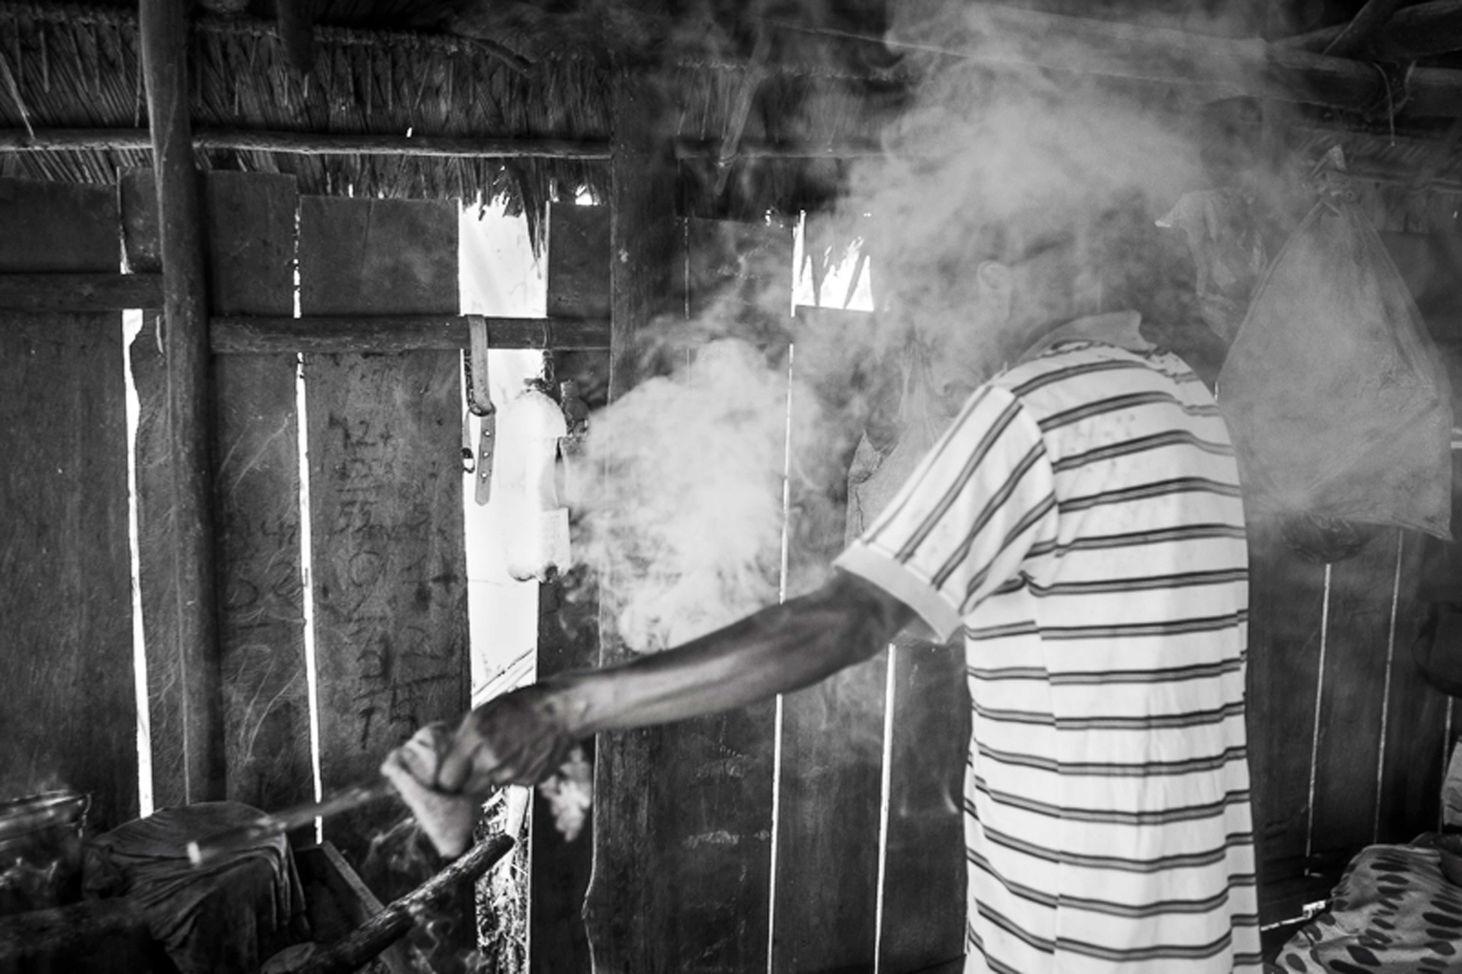 Man becomes engulfed with smoke while burning bamboo.